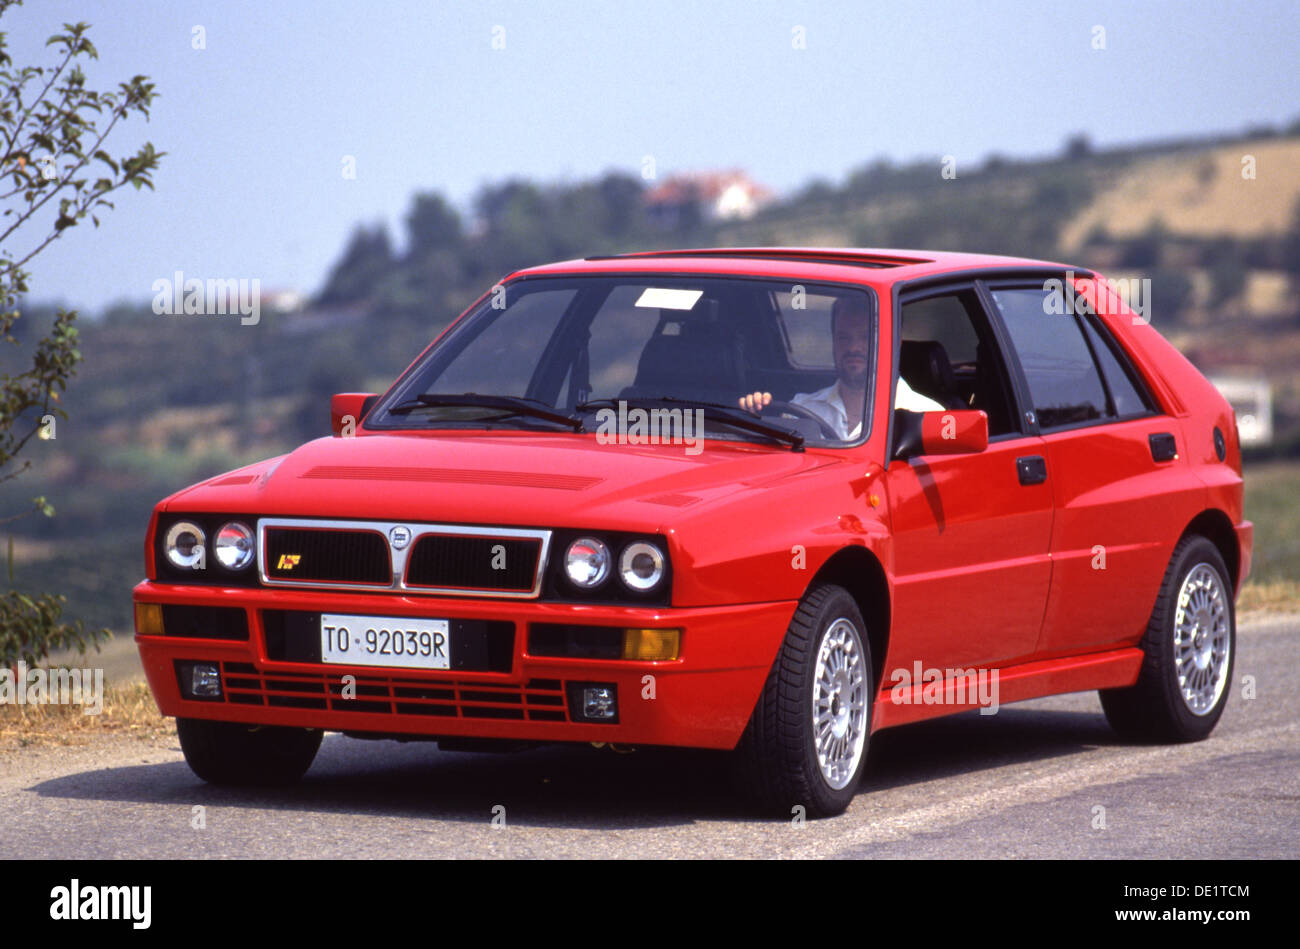 lancia delta integrale hf sports car 4x4 4wd 1990s - in red in swiss